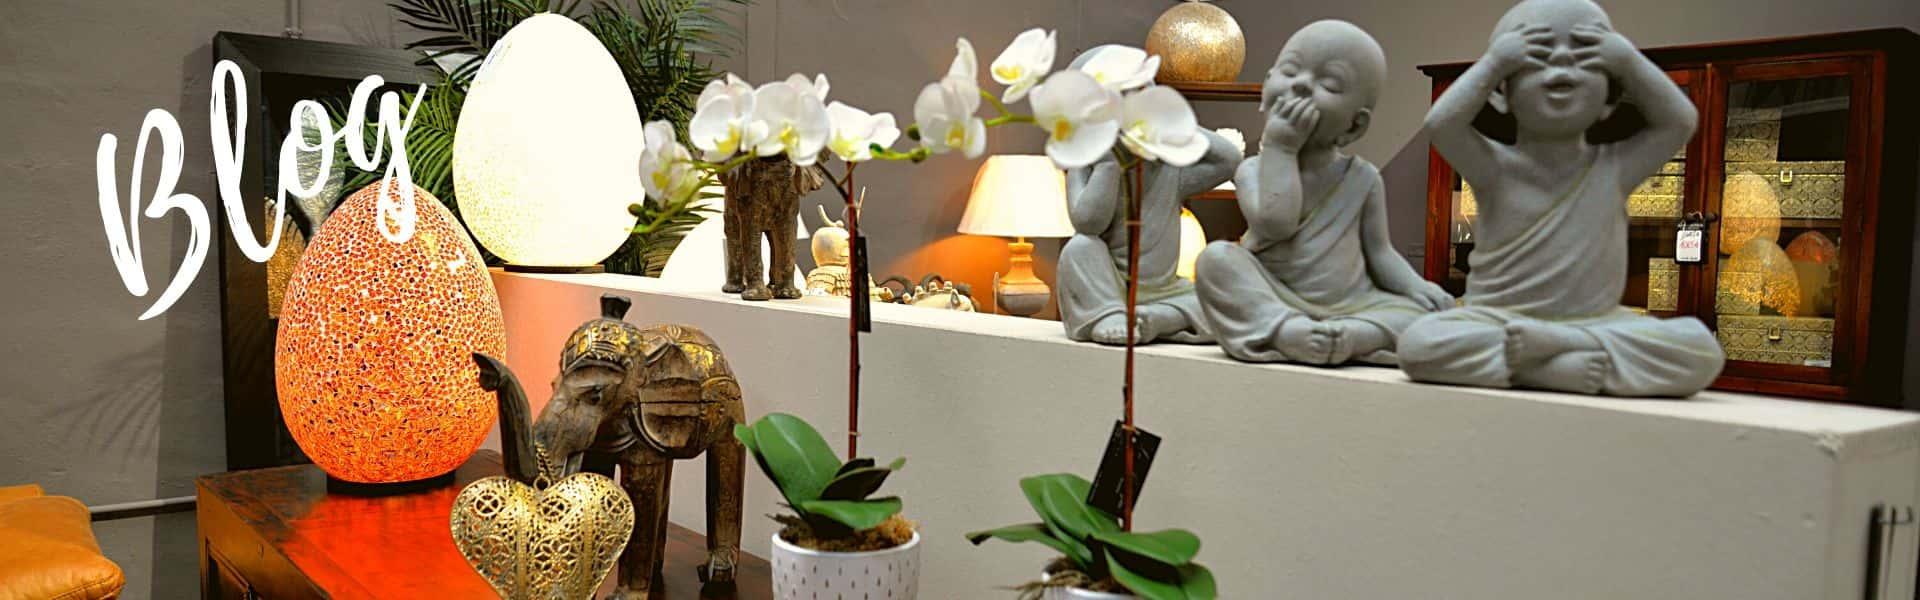 blog de muebles de jardin